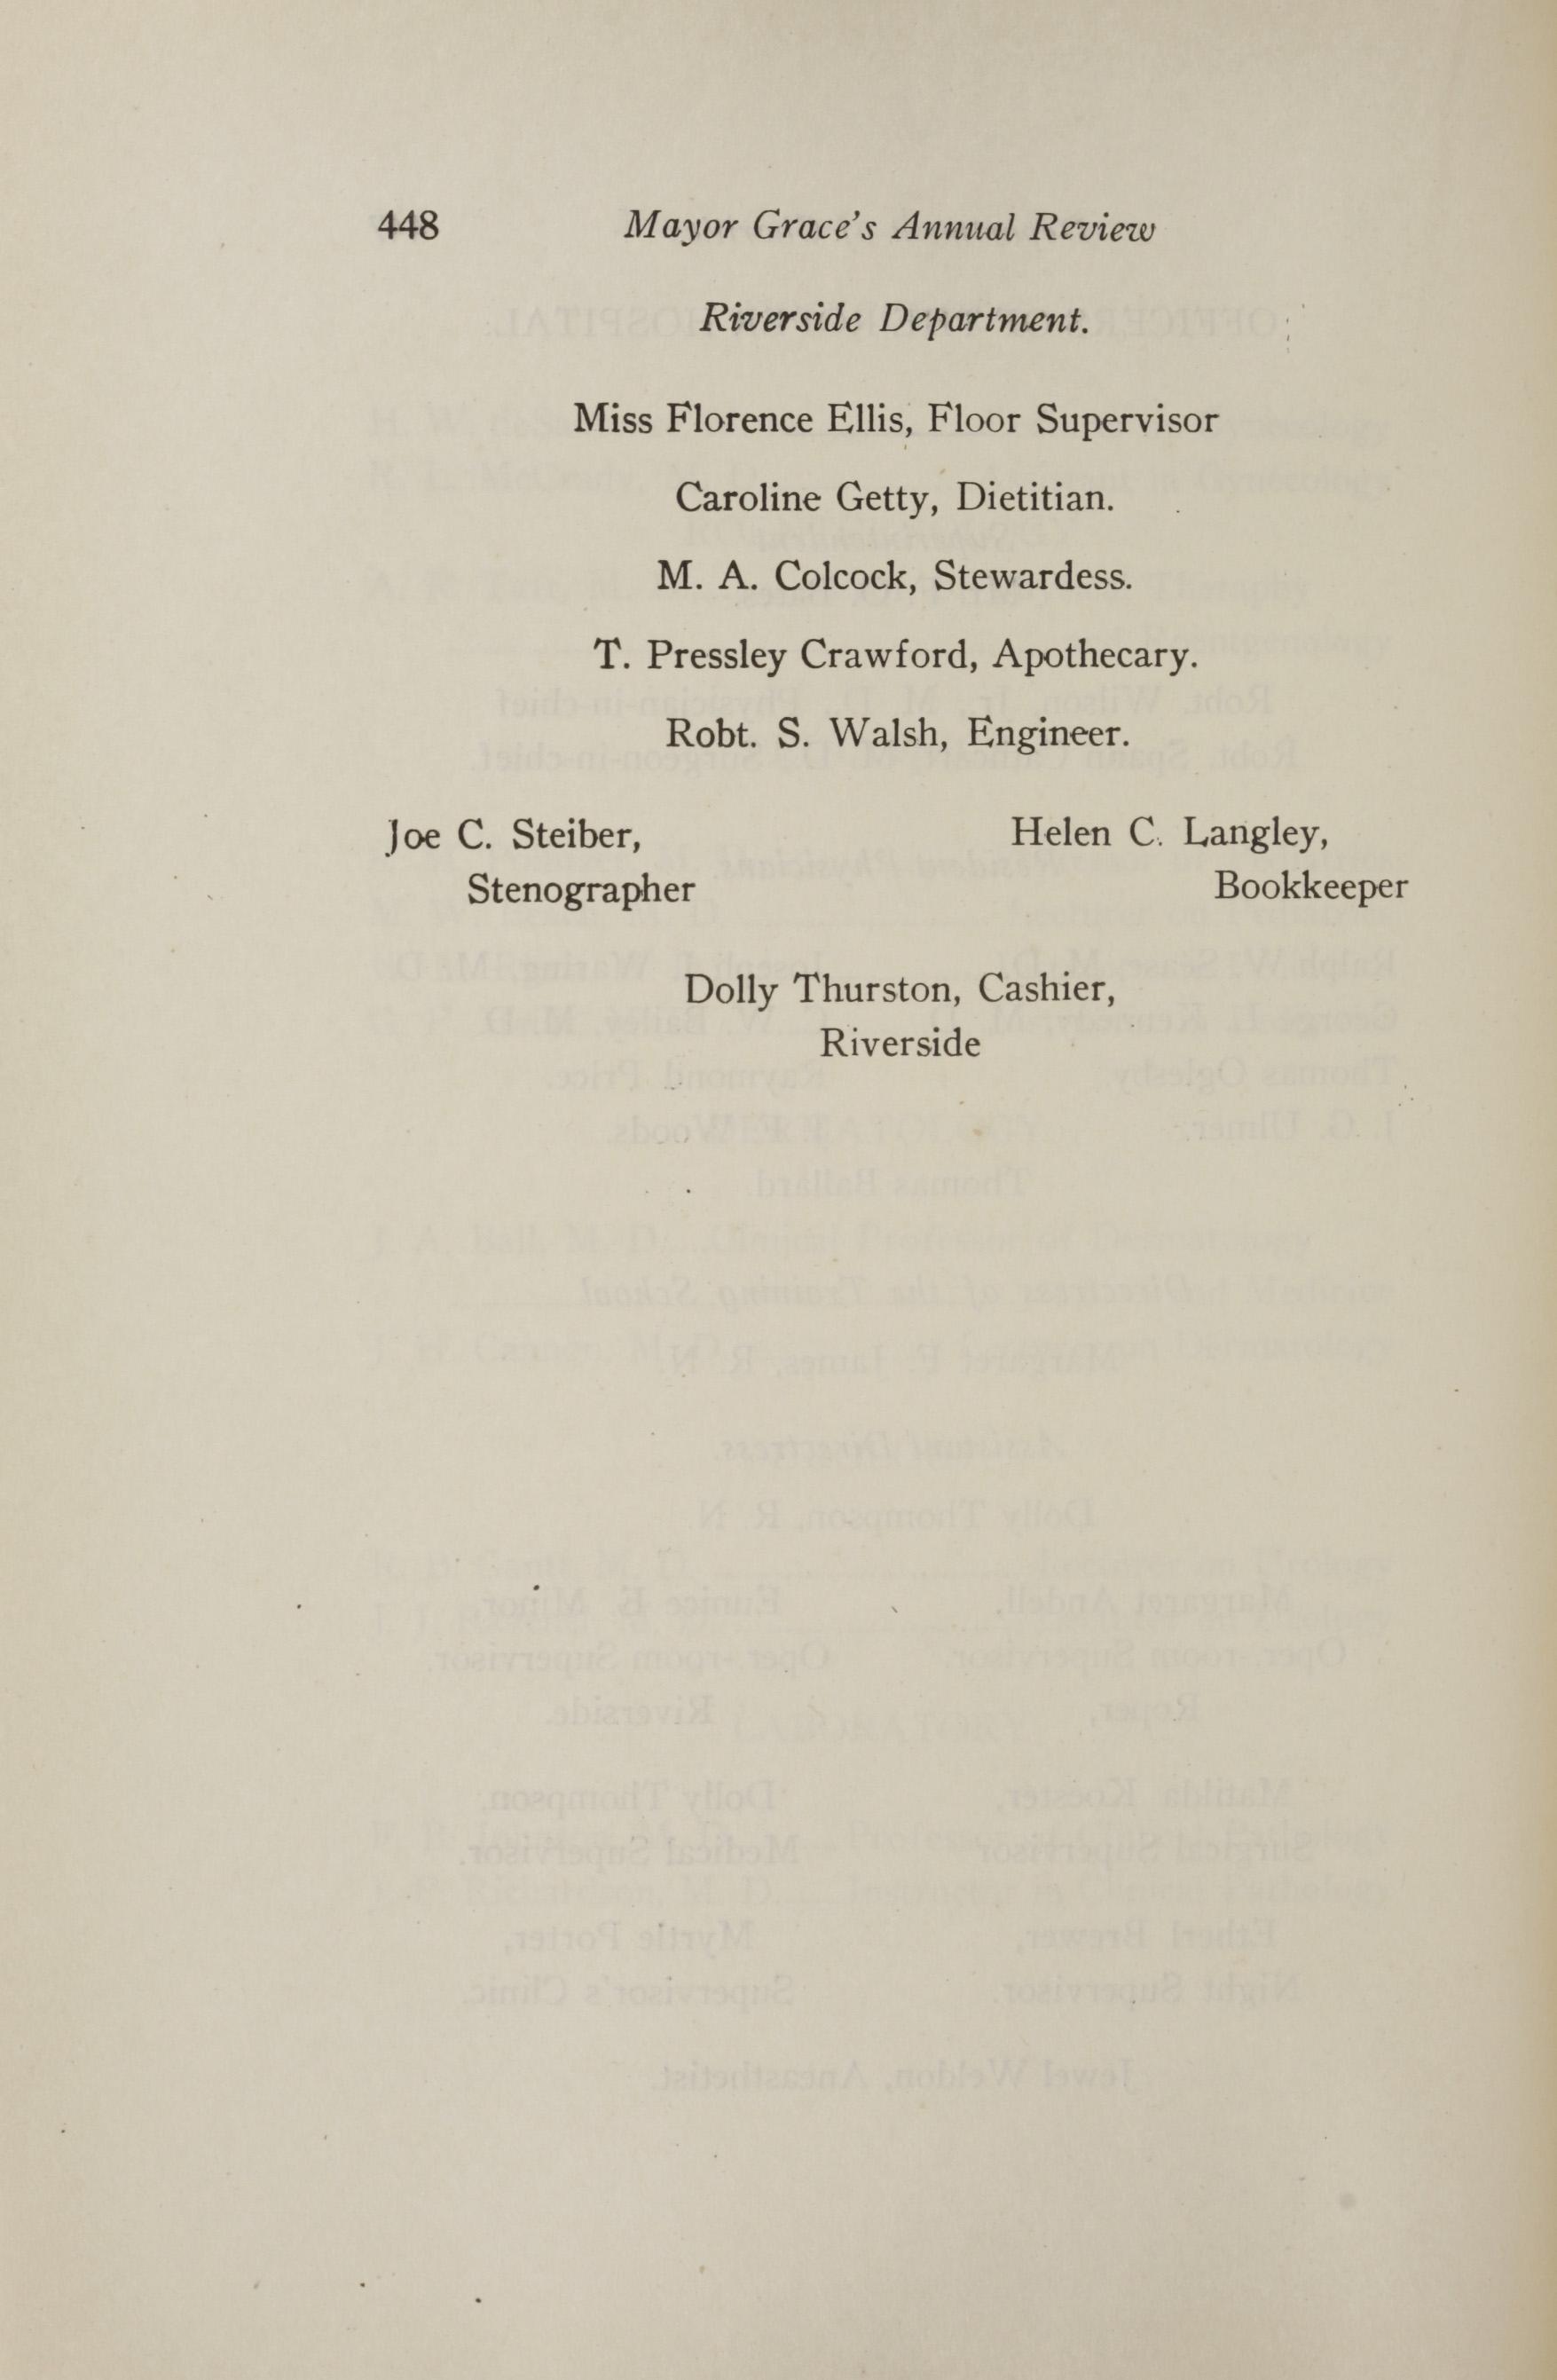 Charleston Yearbook, 1921, page 448